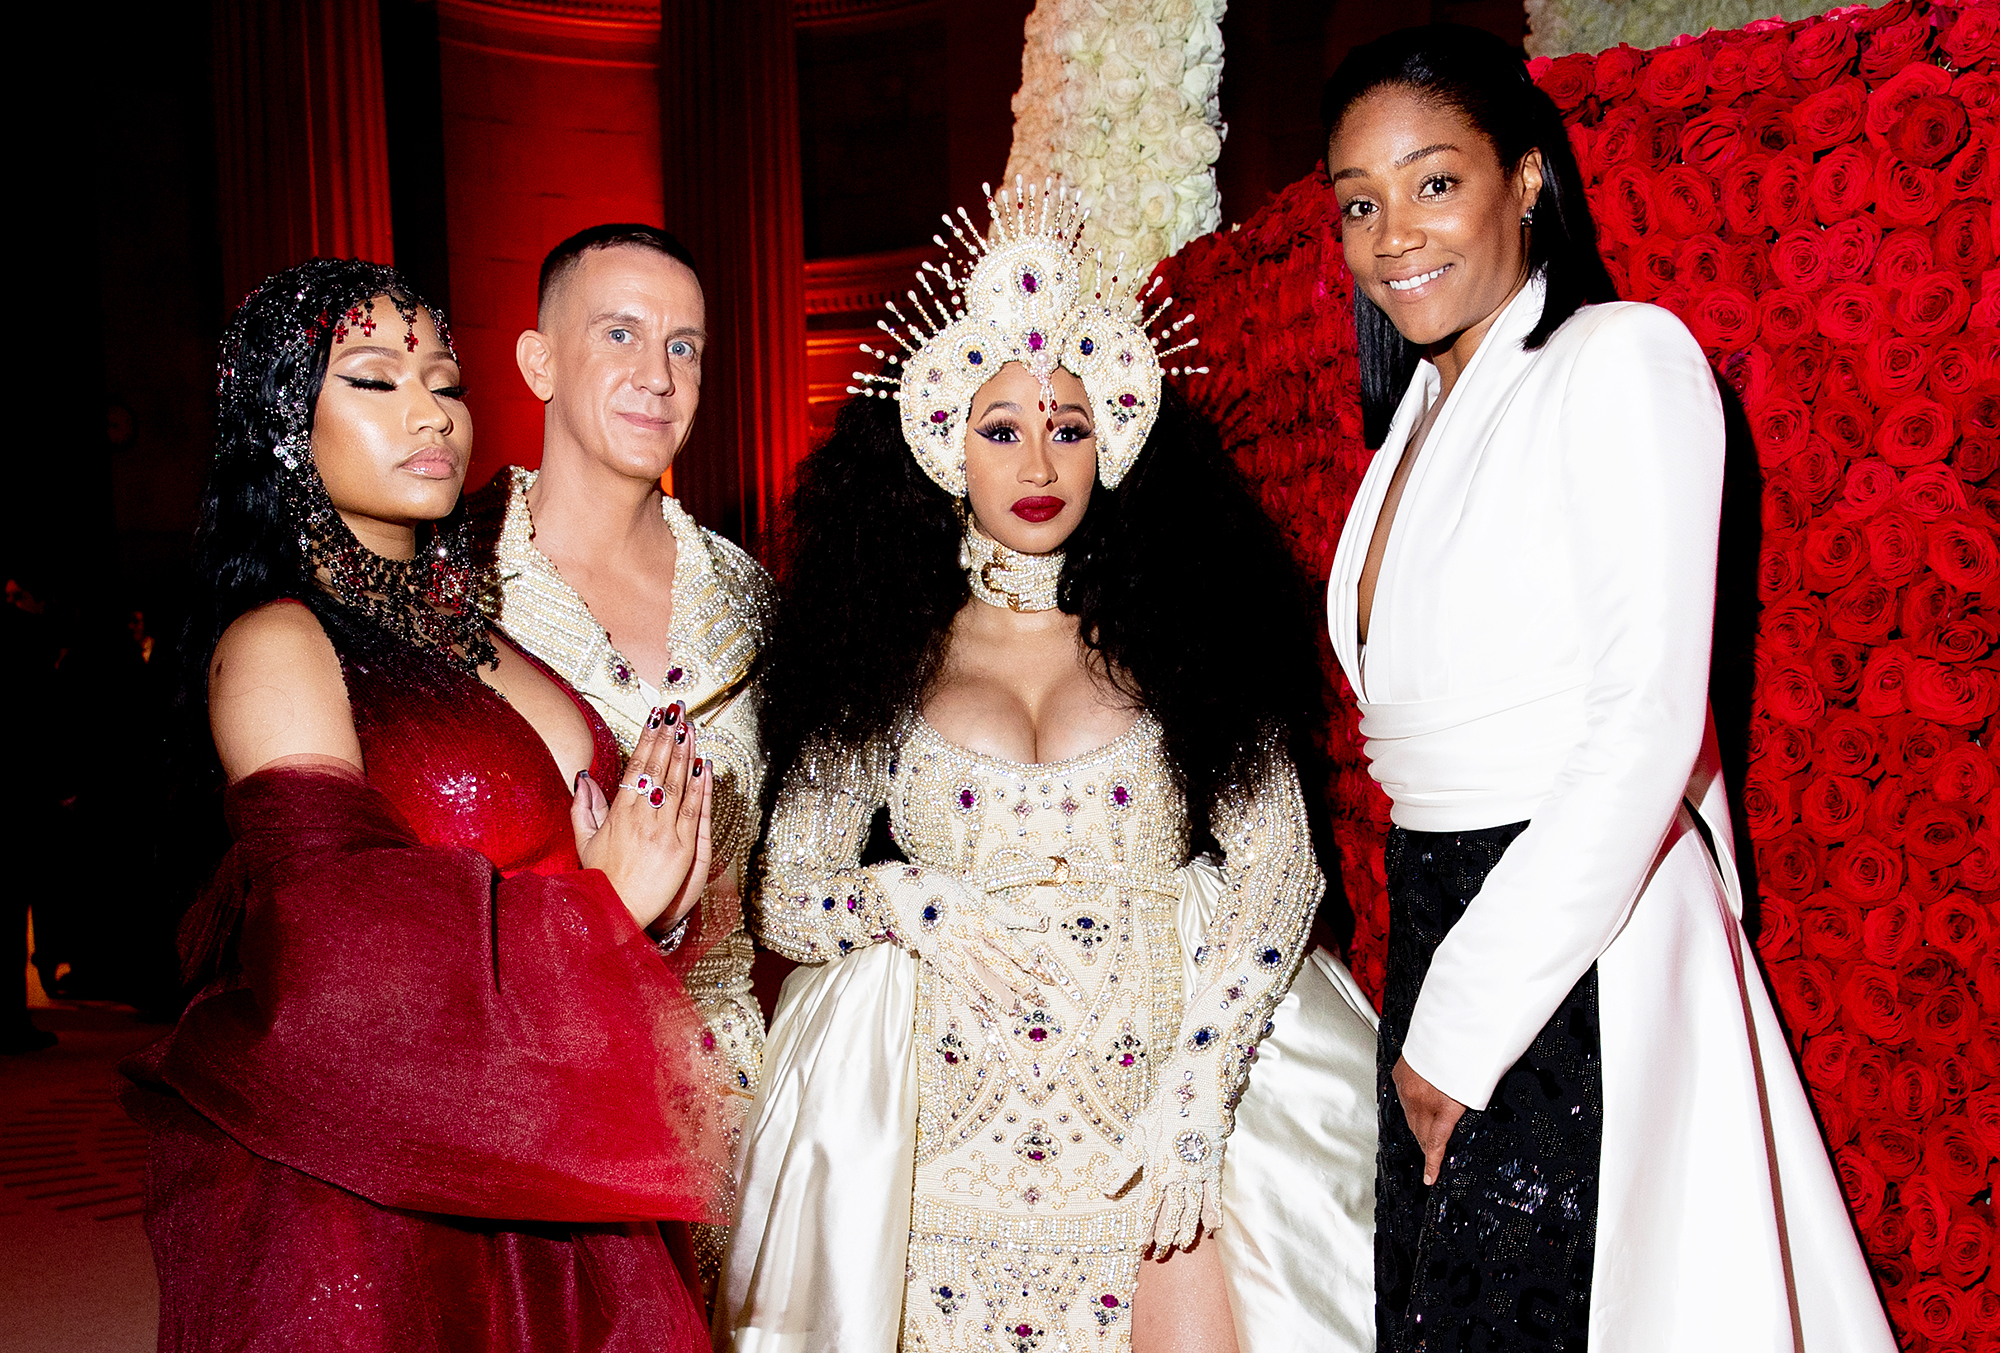 Cardi B Nicki Minaj Feud